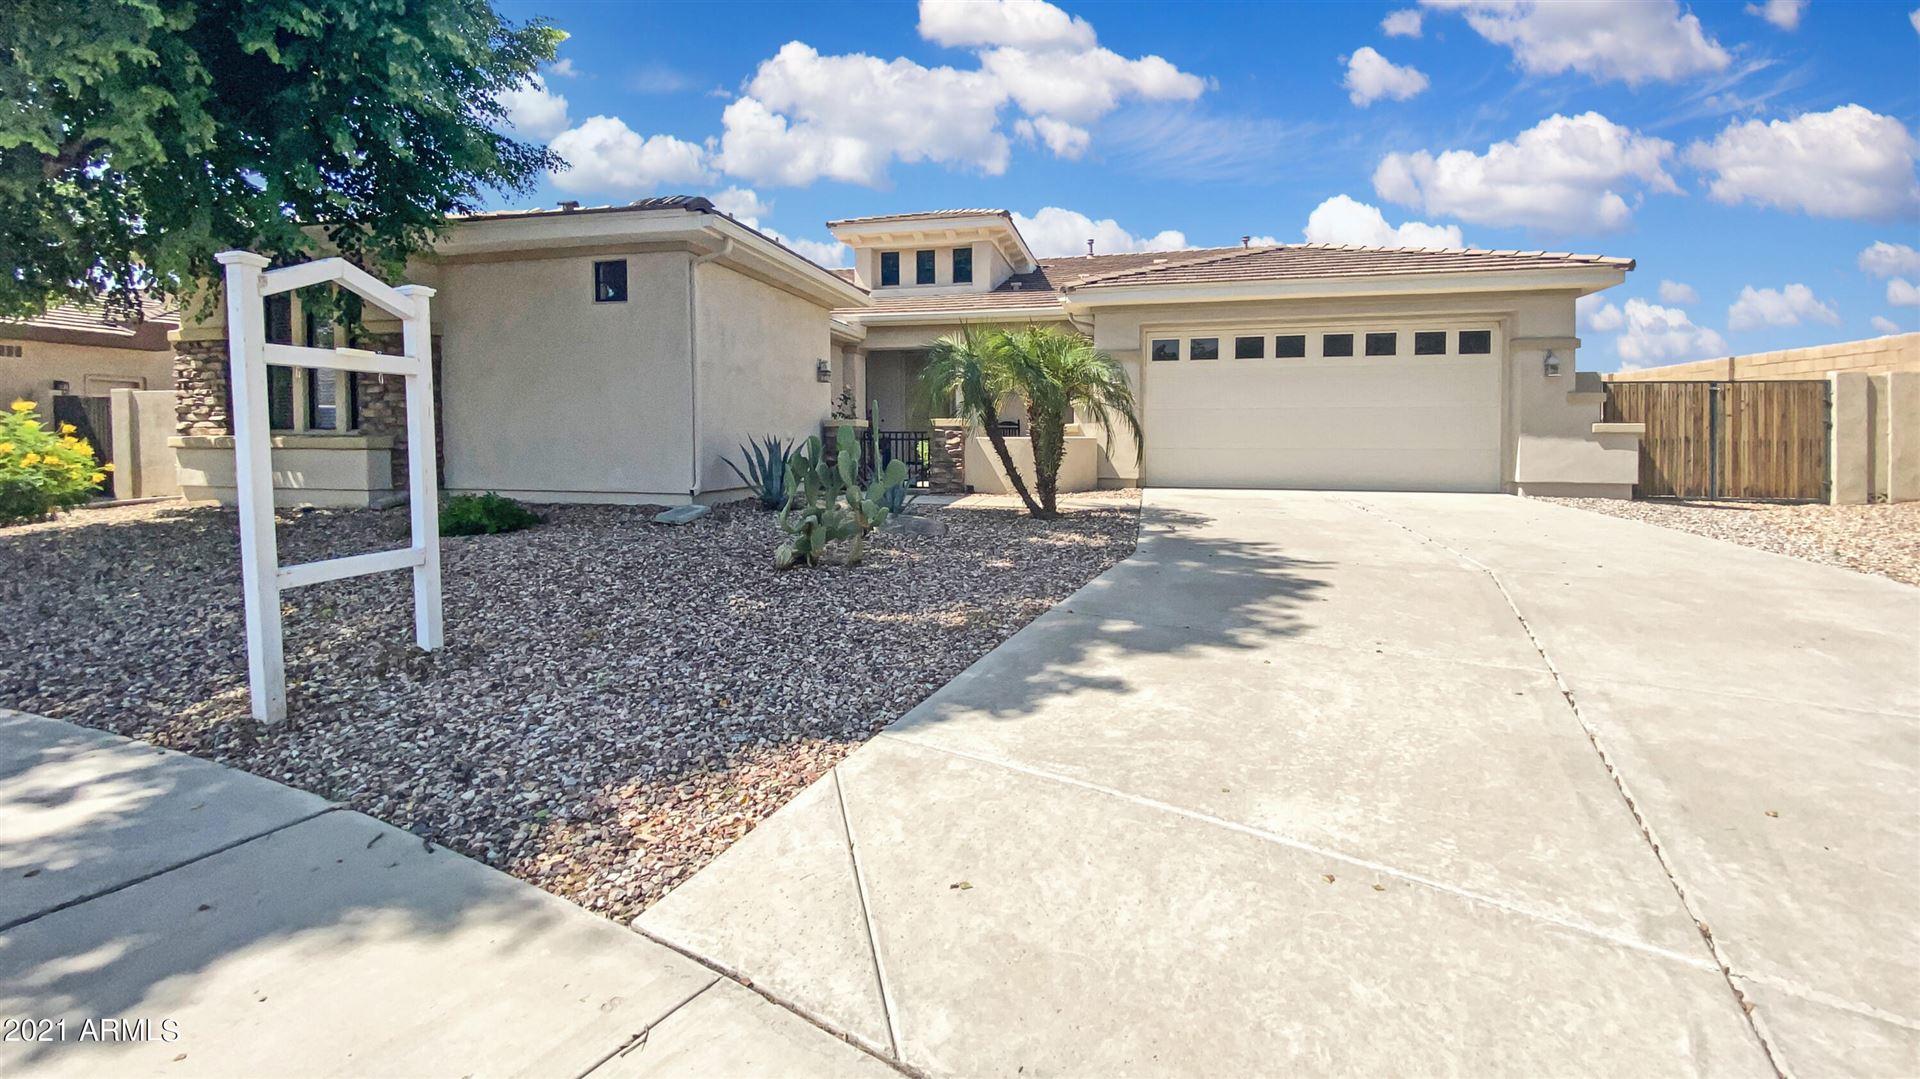 4352 N 161ST Drive, Goodyear, AZ 85395 - #: 6281814